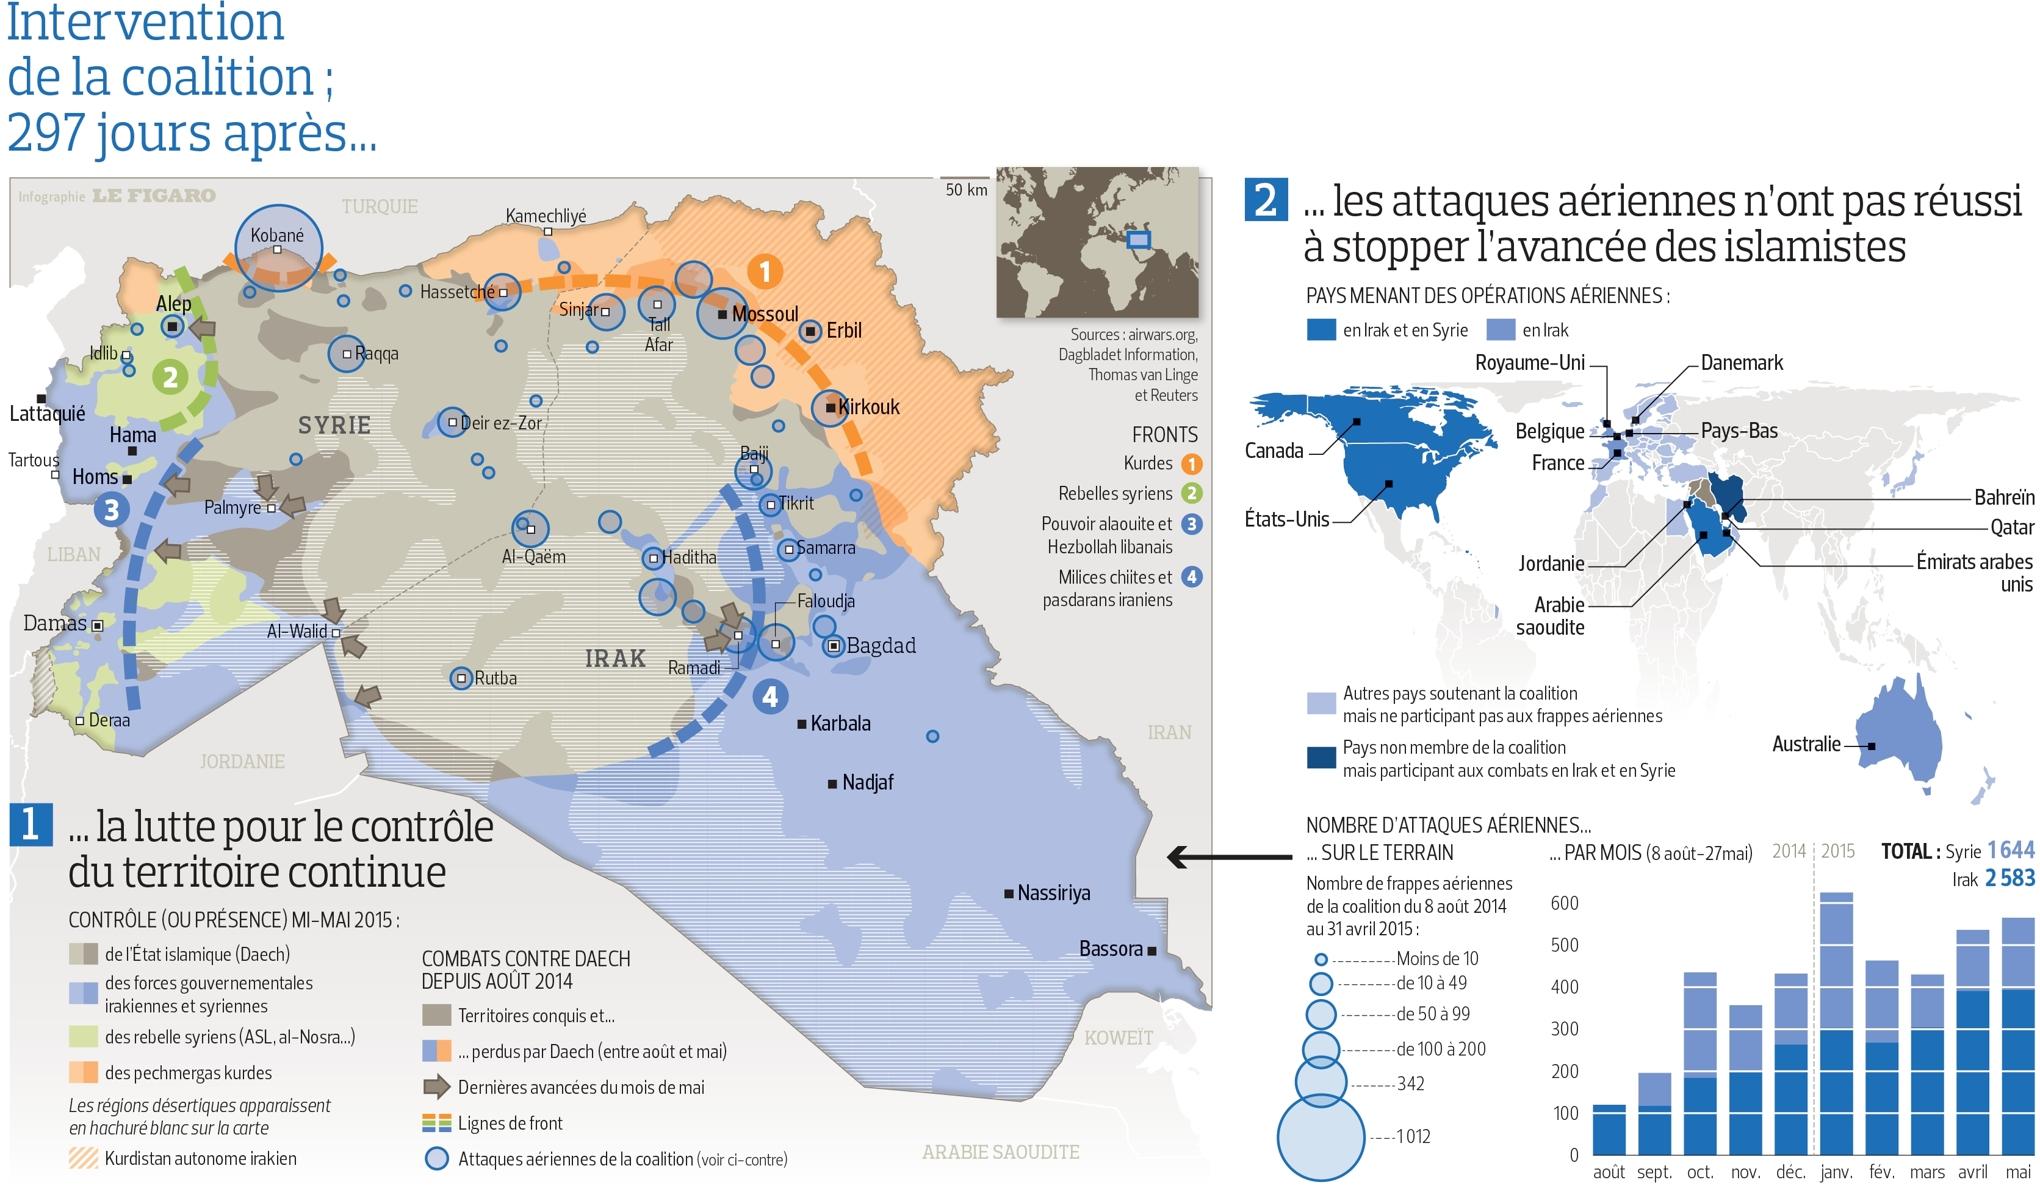 http://www.les-crises.fr/wp-content/uploads/2015/10/frappes-usa-2.jpg